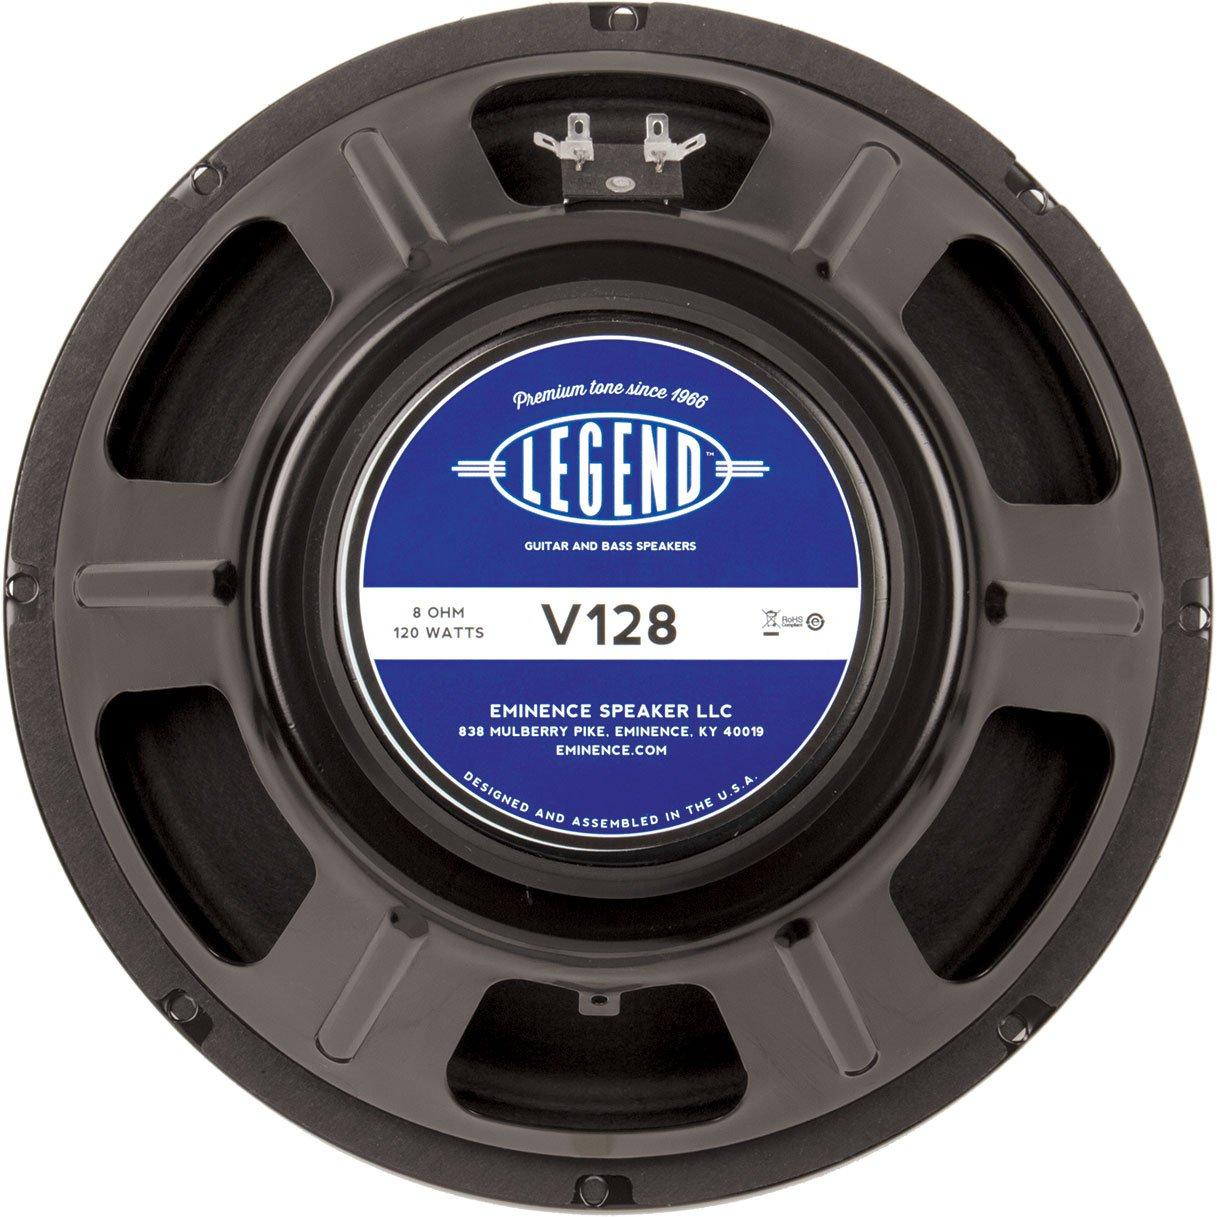 "Eminence Legend V128 12"" Guitar Speaker 120W 8 Ohm"